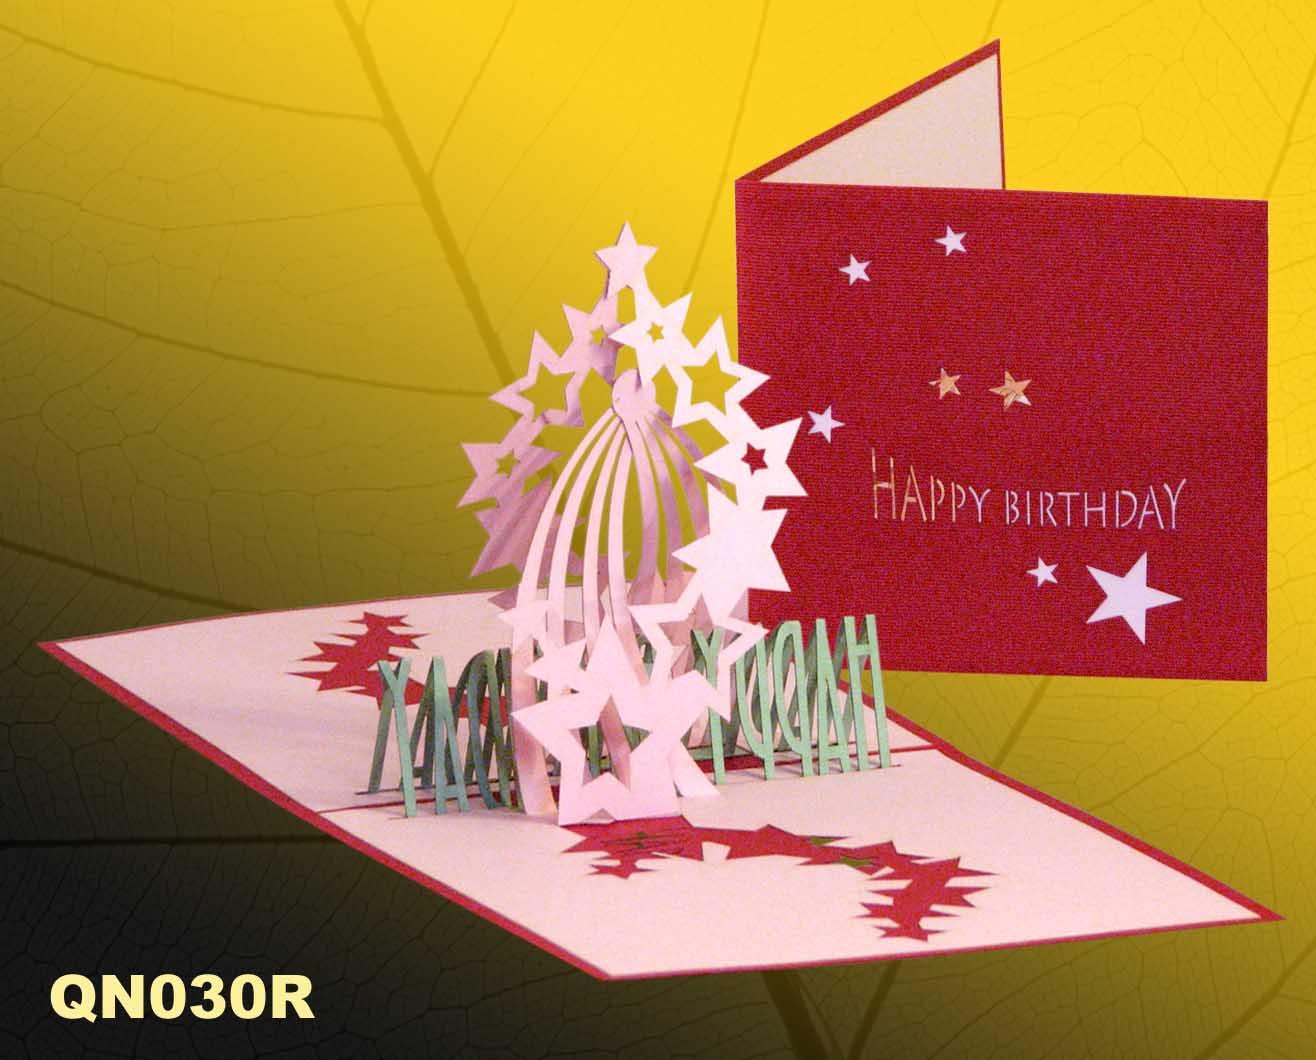 Birthday star 2 pop up handmade greeting cards qn030 kristyandbryce Images